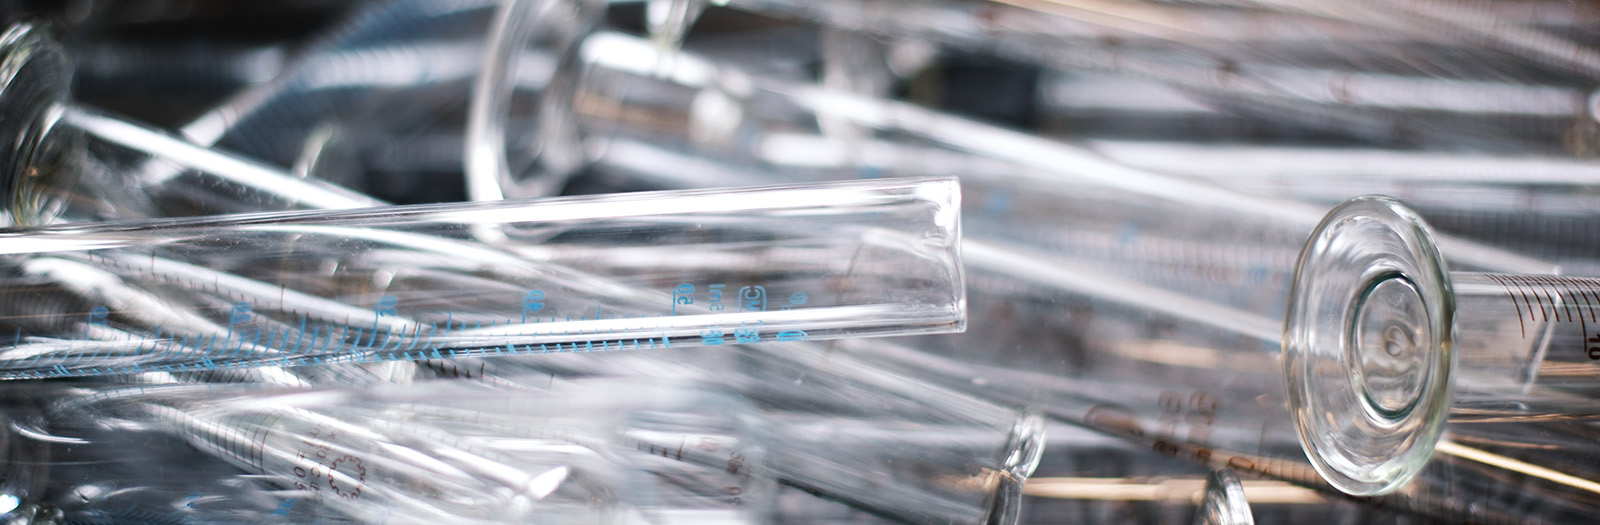 glass medical waste